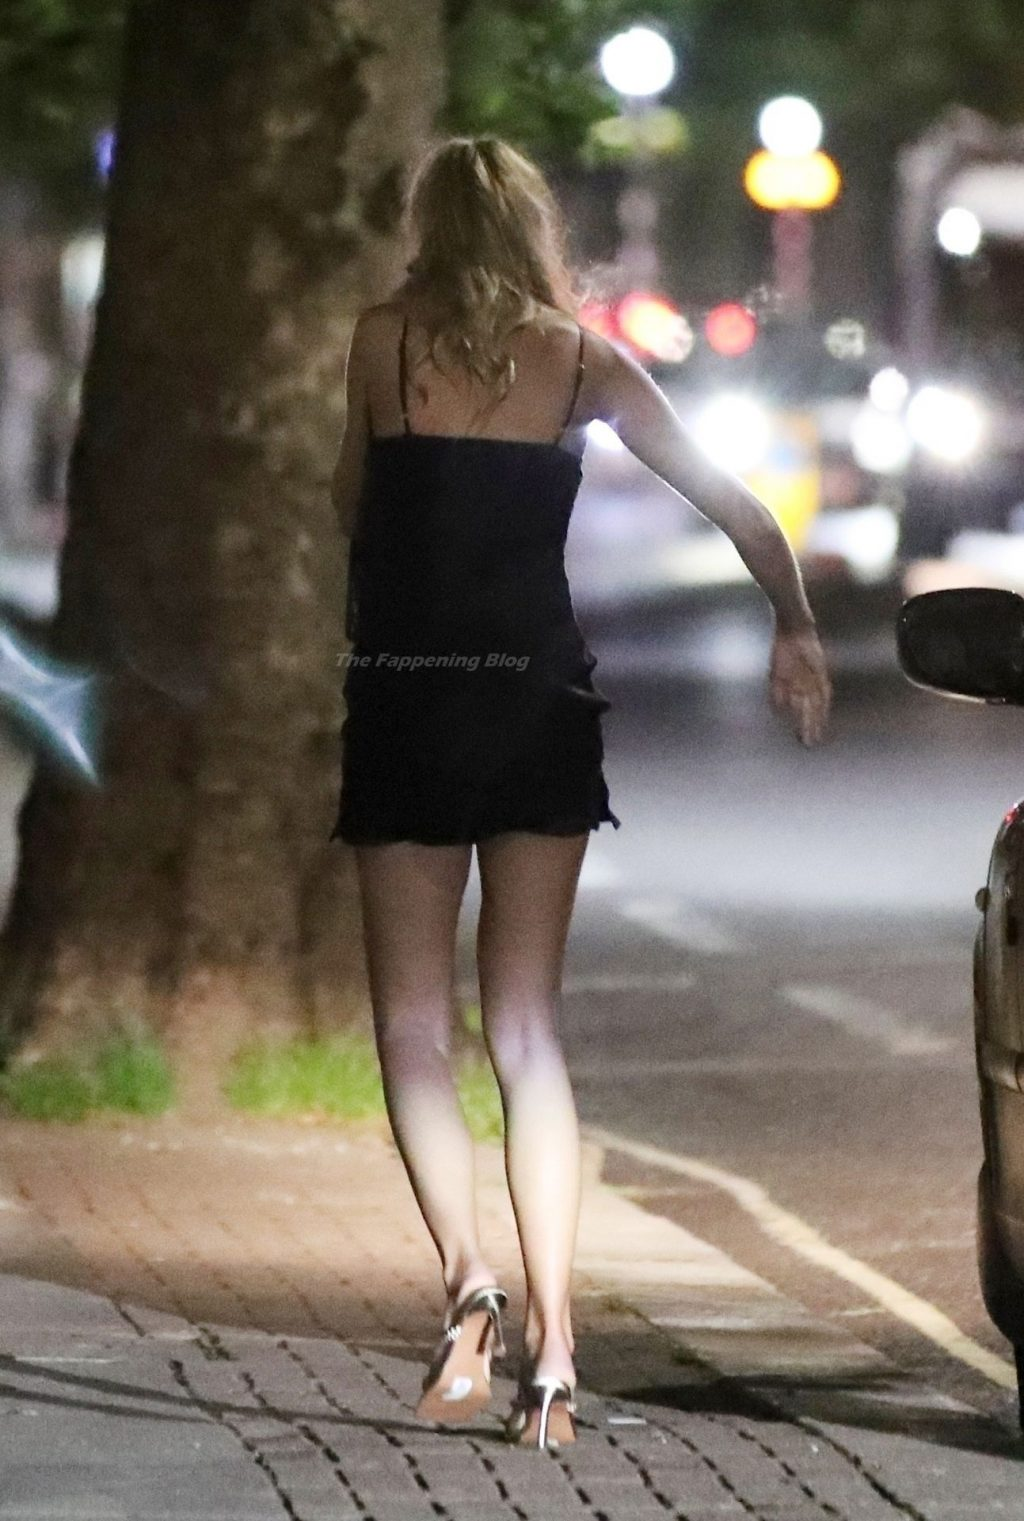 Zara McDermott Flashes Her Pink Panties in London (24 Photos)